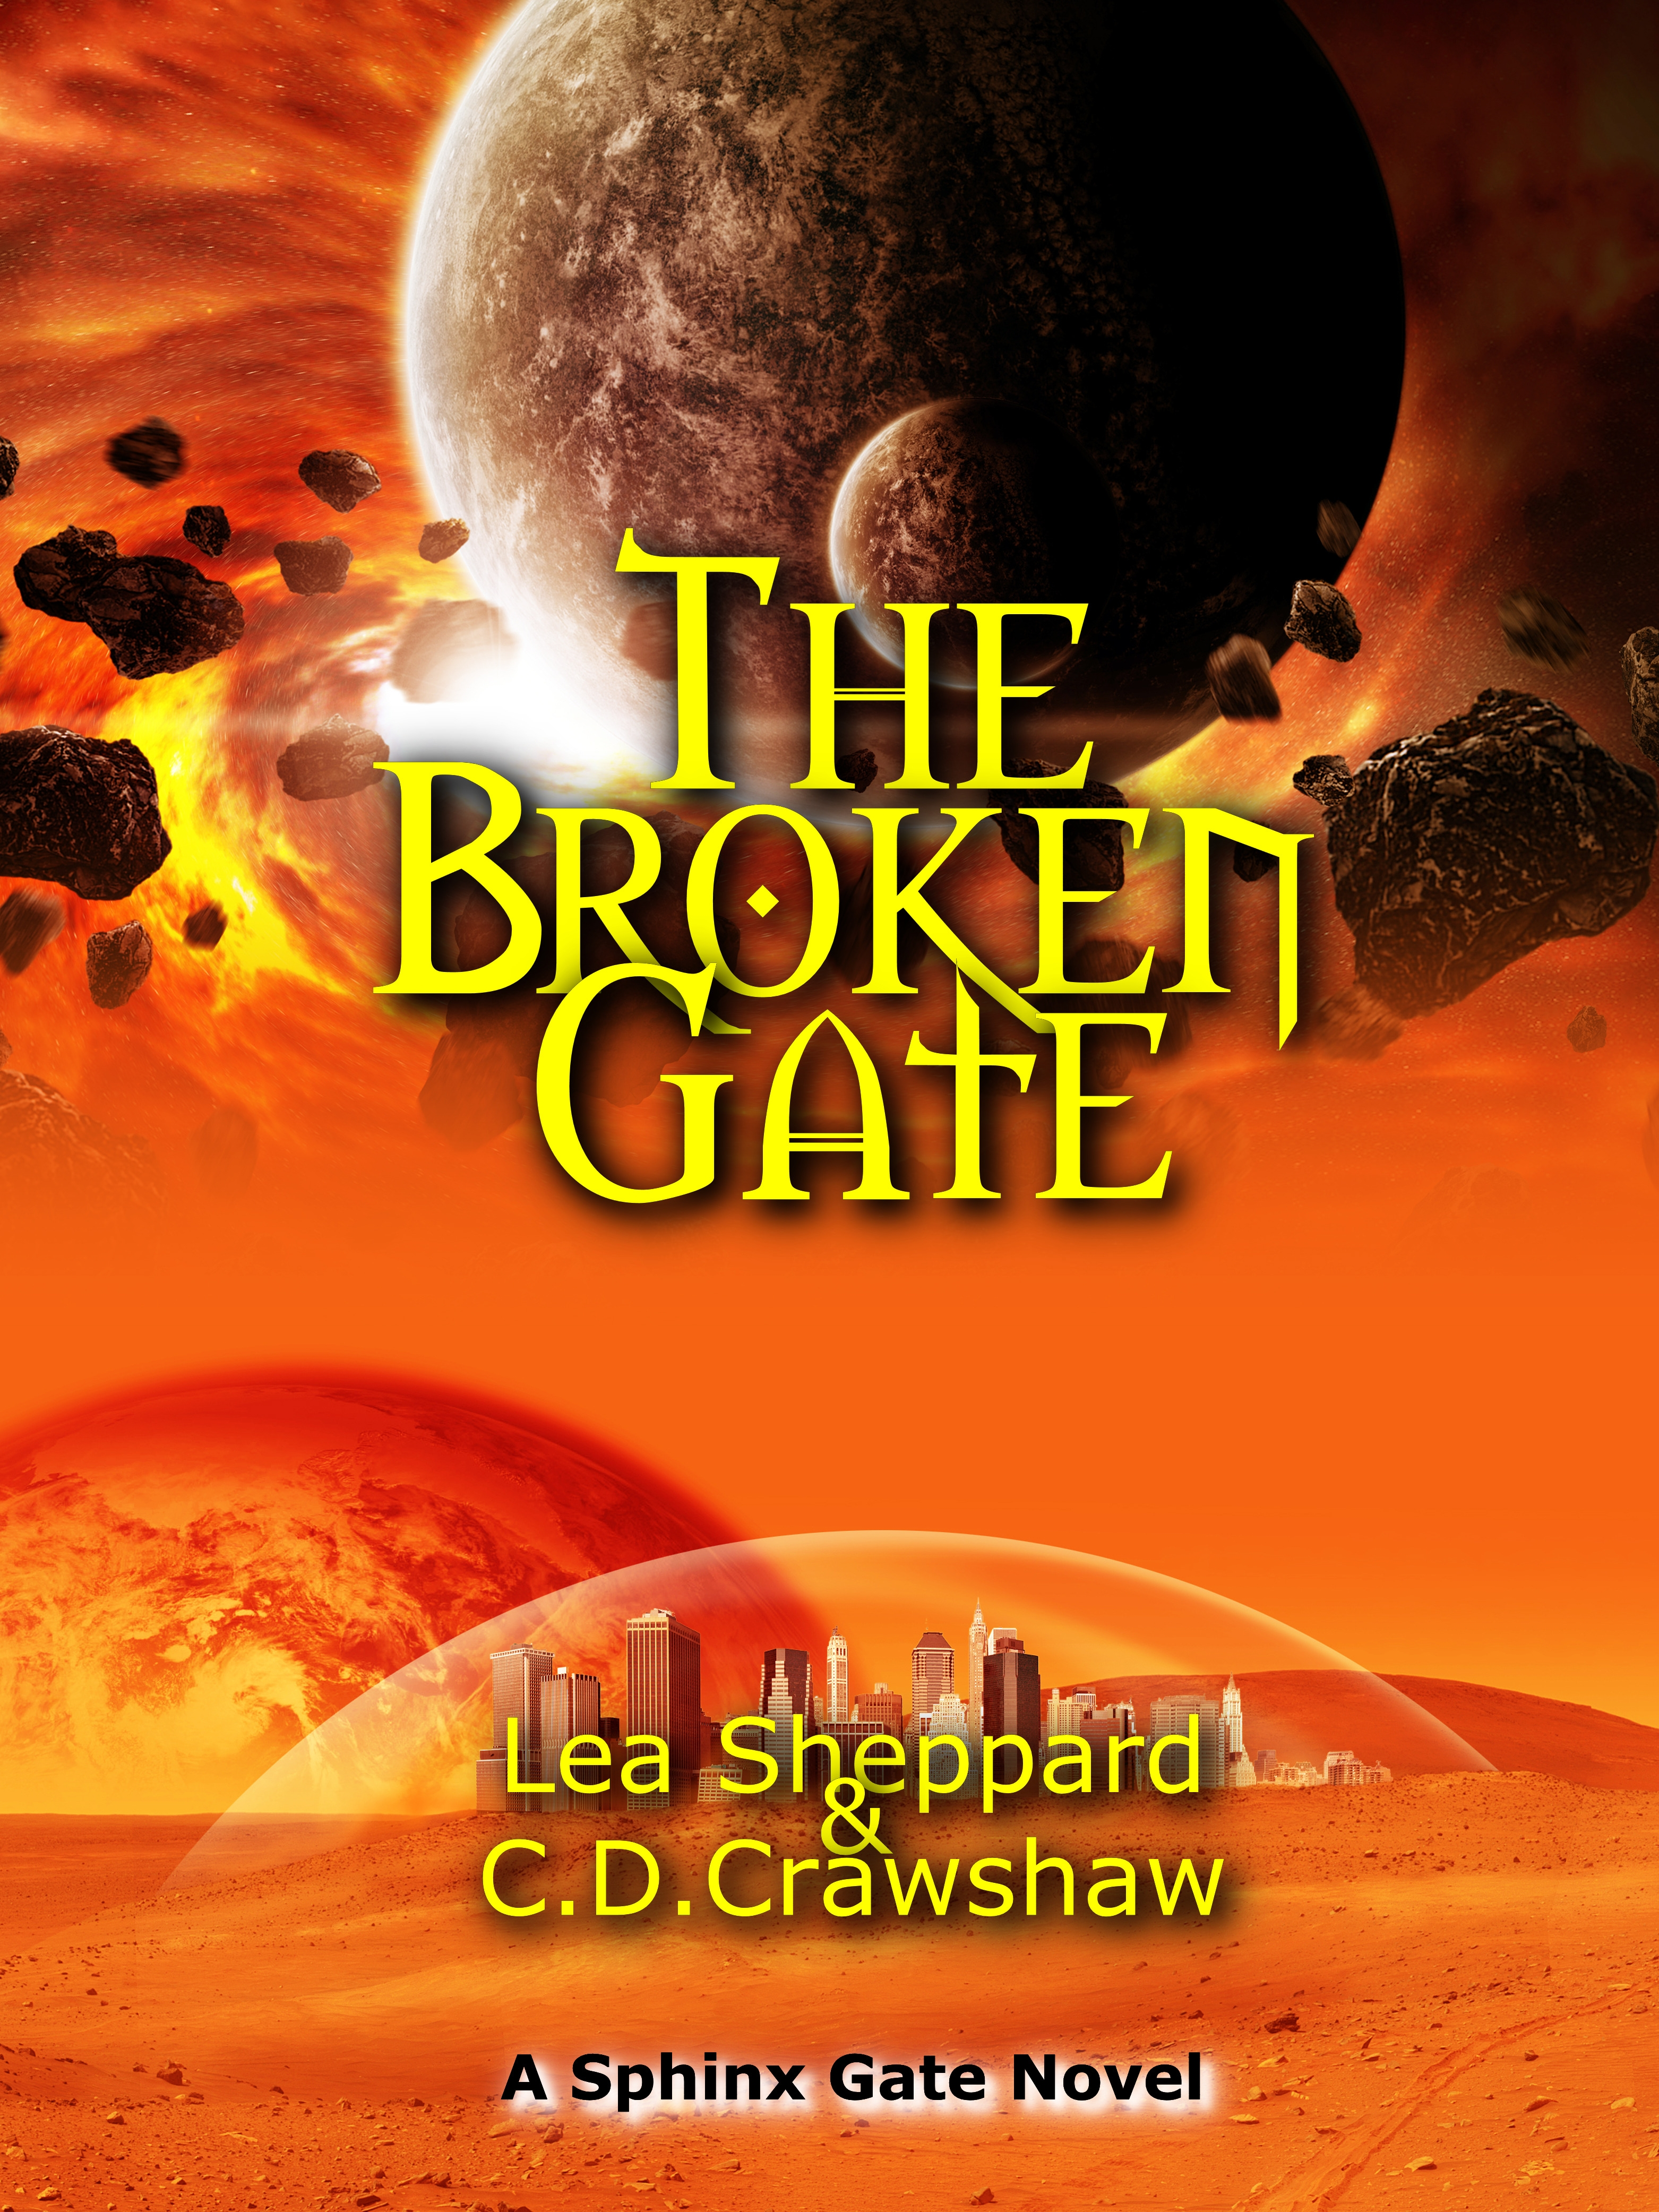 brokengate-300dpi-3125x4167